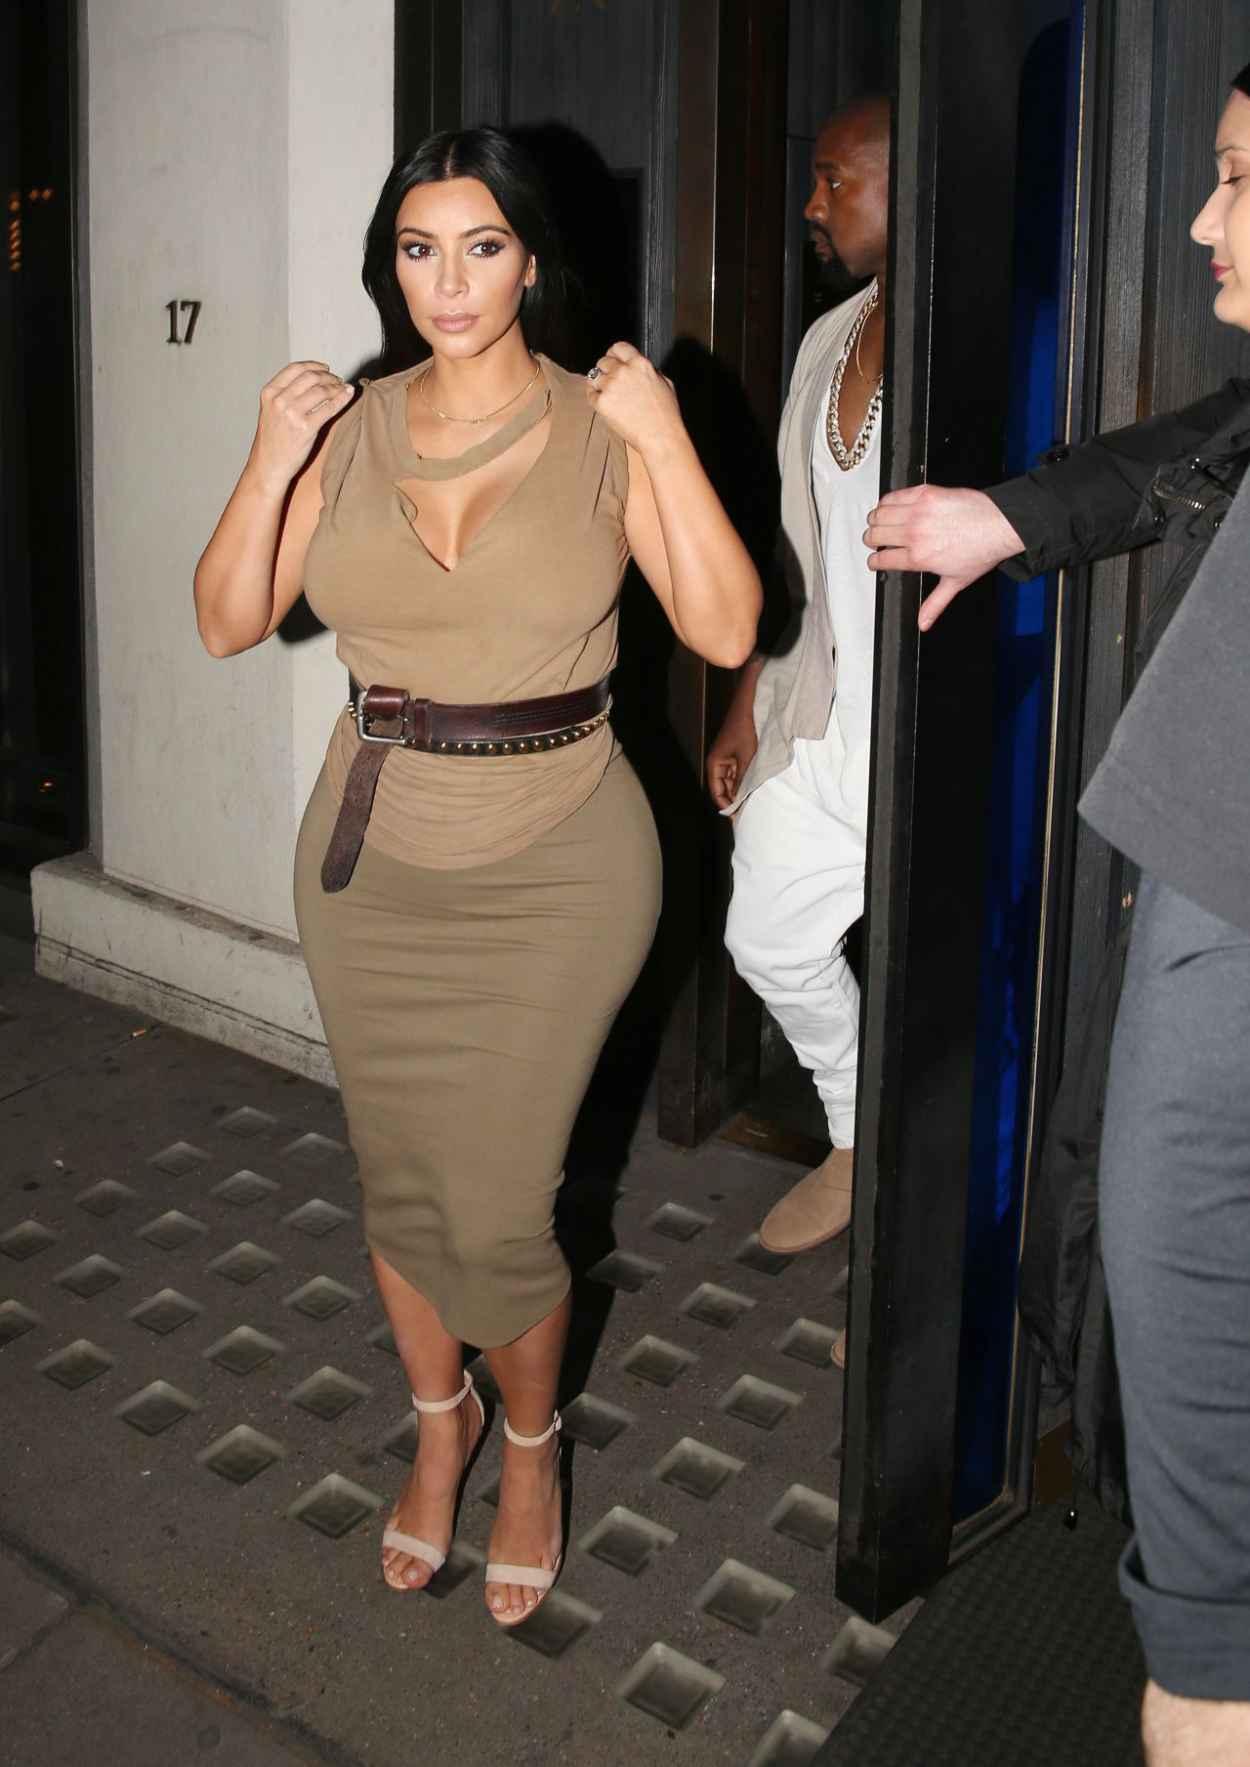 Kim Kardashian Night Out Style U2013 At Hakkasan June 2015 U2013 Celebsla.com